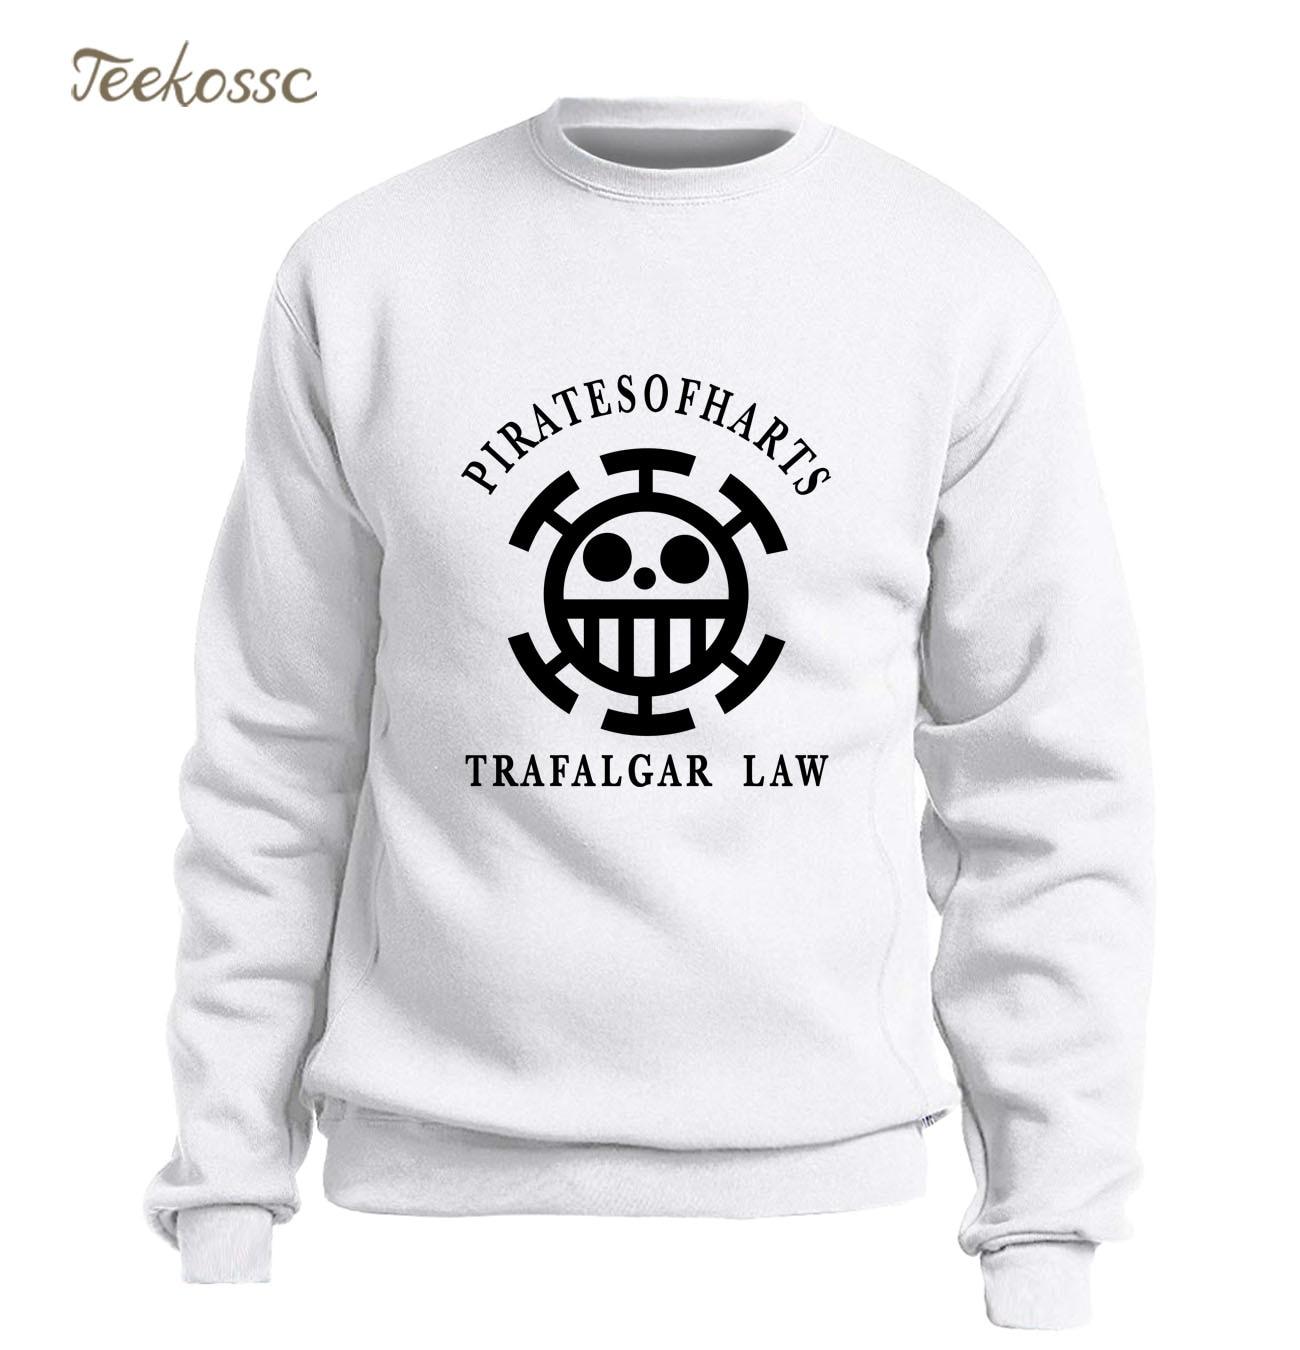 Anime One Piece Sweatshirt Men Trafalgar Law Hoodie Fleece Warm The Pirate King Luffy Crewneck Sweatshirts Mens White Streetwear